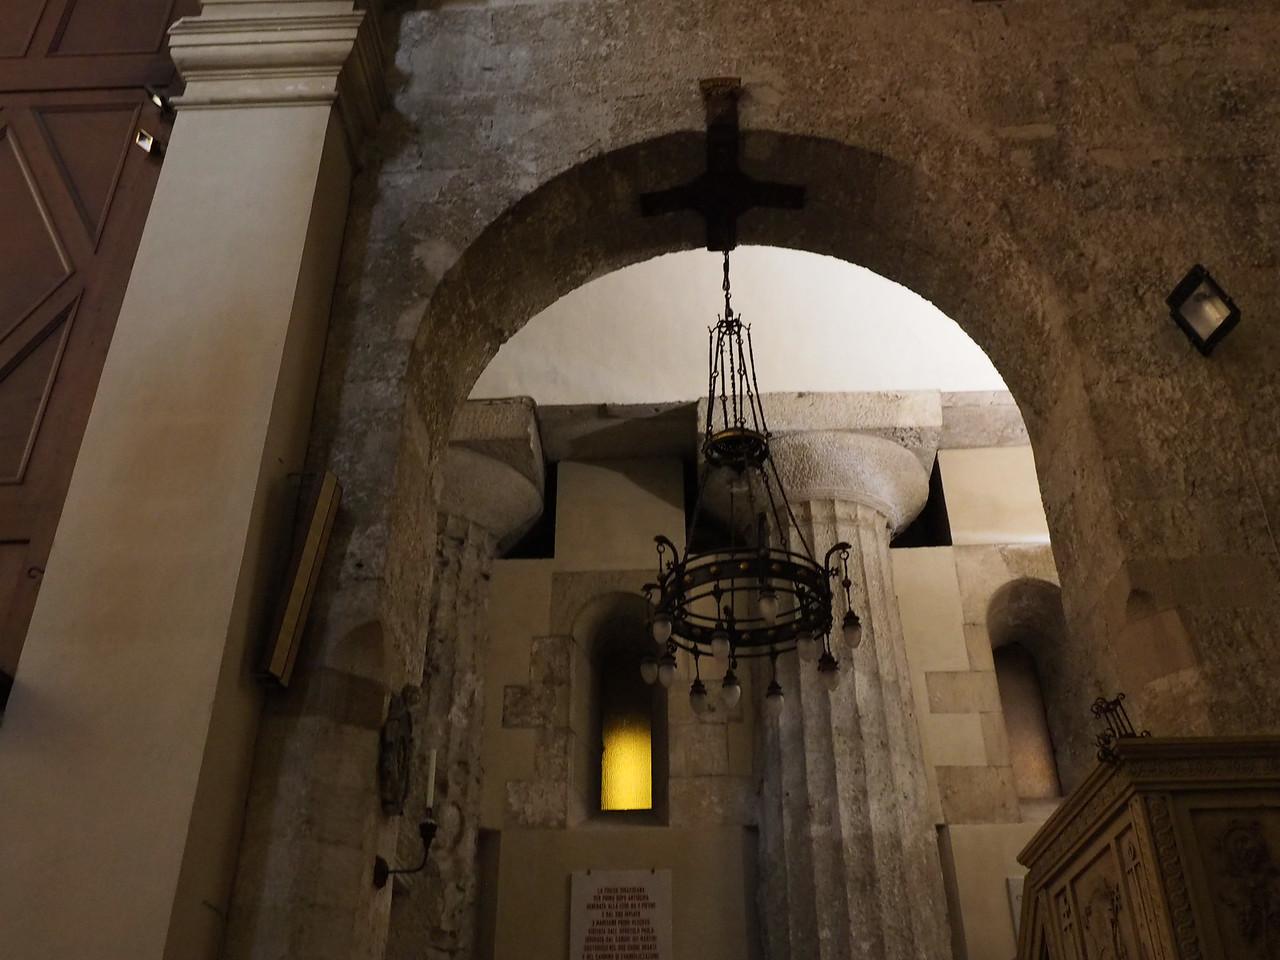 Chapel with chandelier and original Greek column